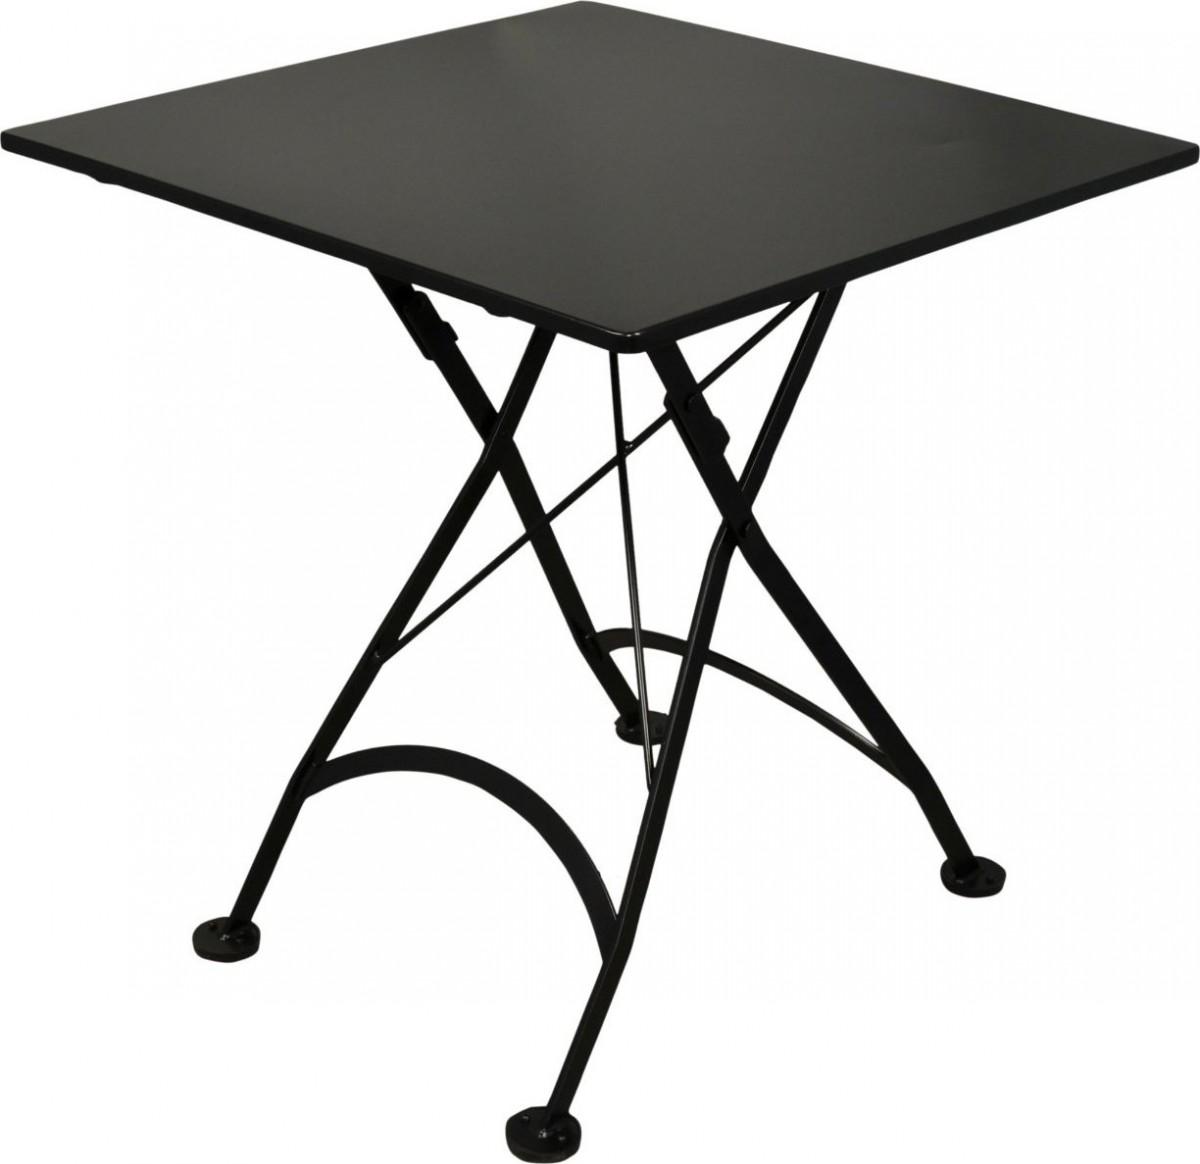 Furniture DesignHouse 28u2033 Square Folding Bistro Table